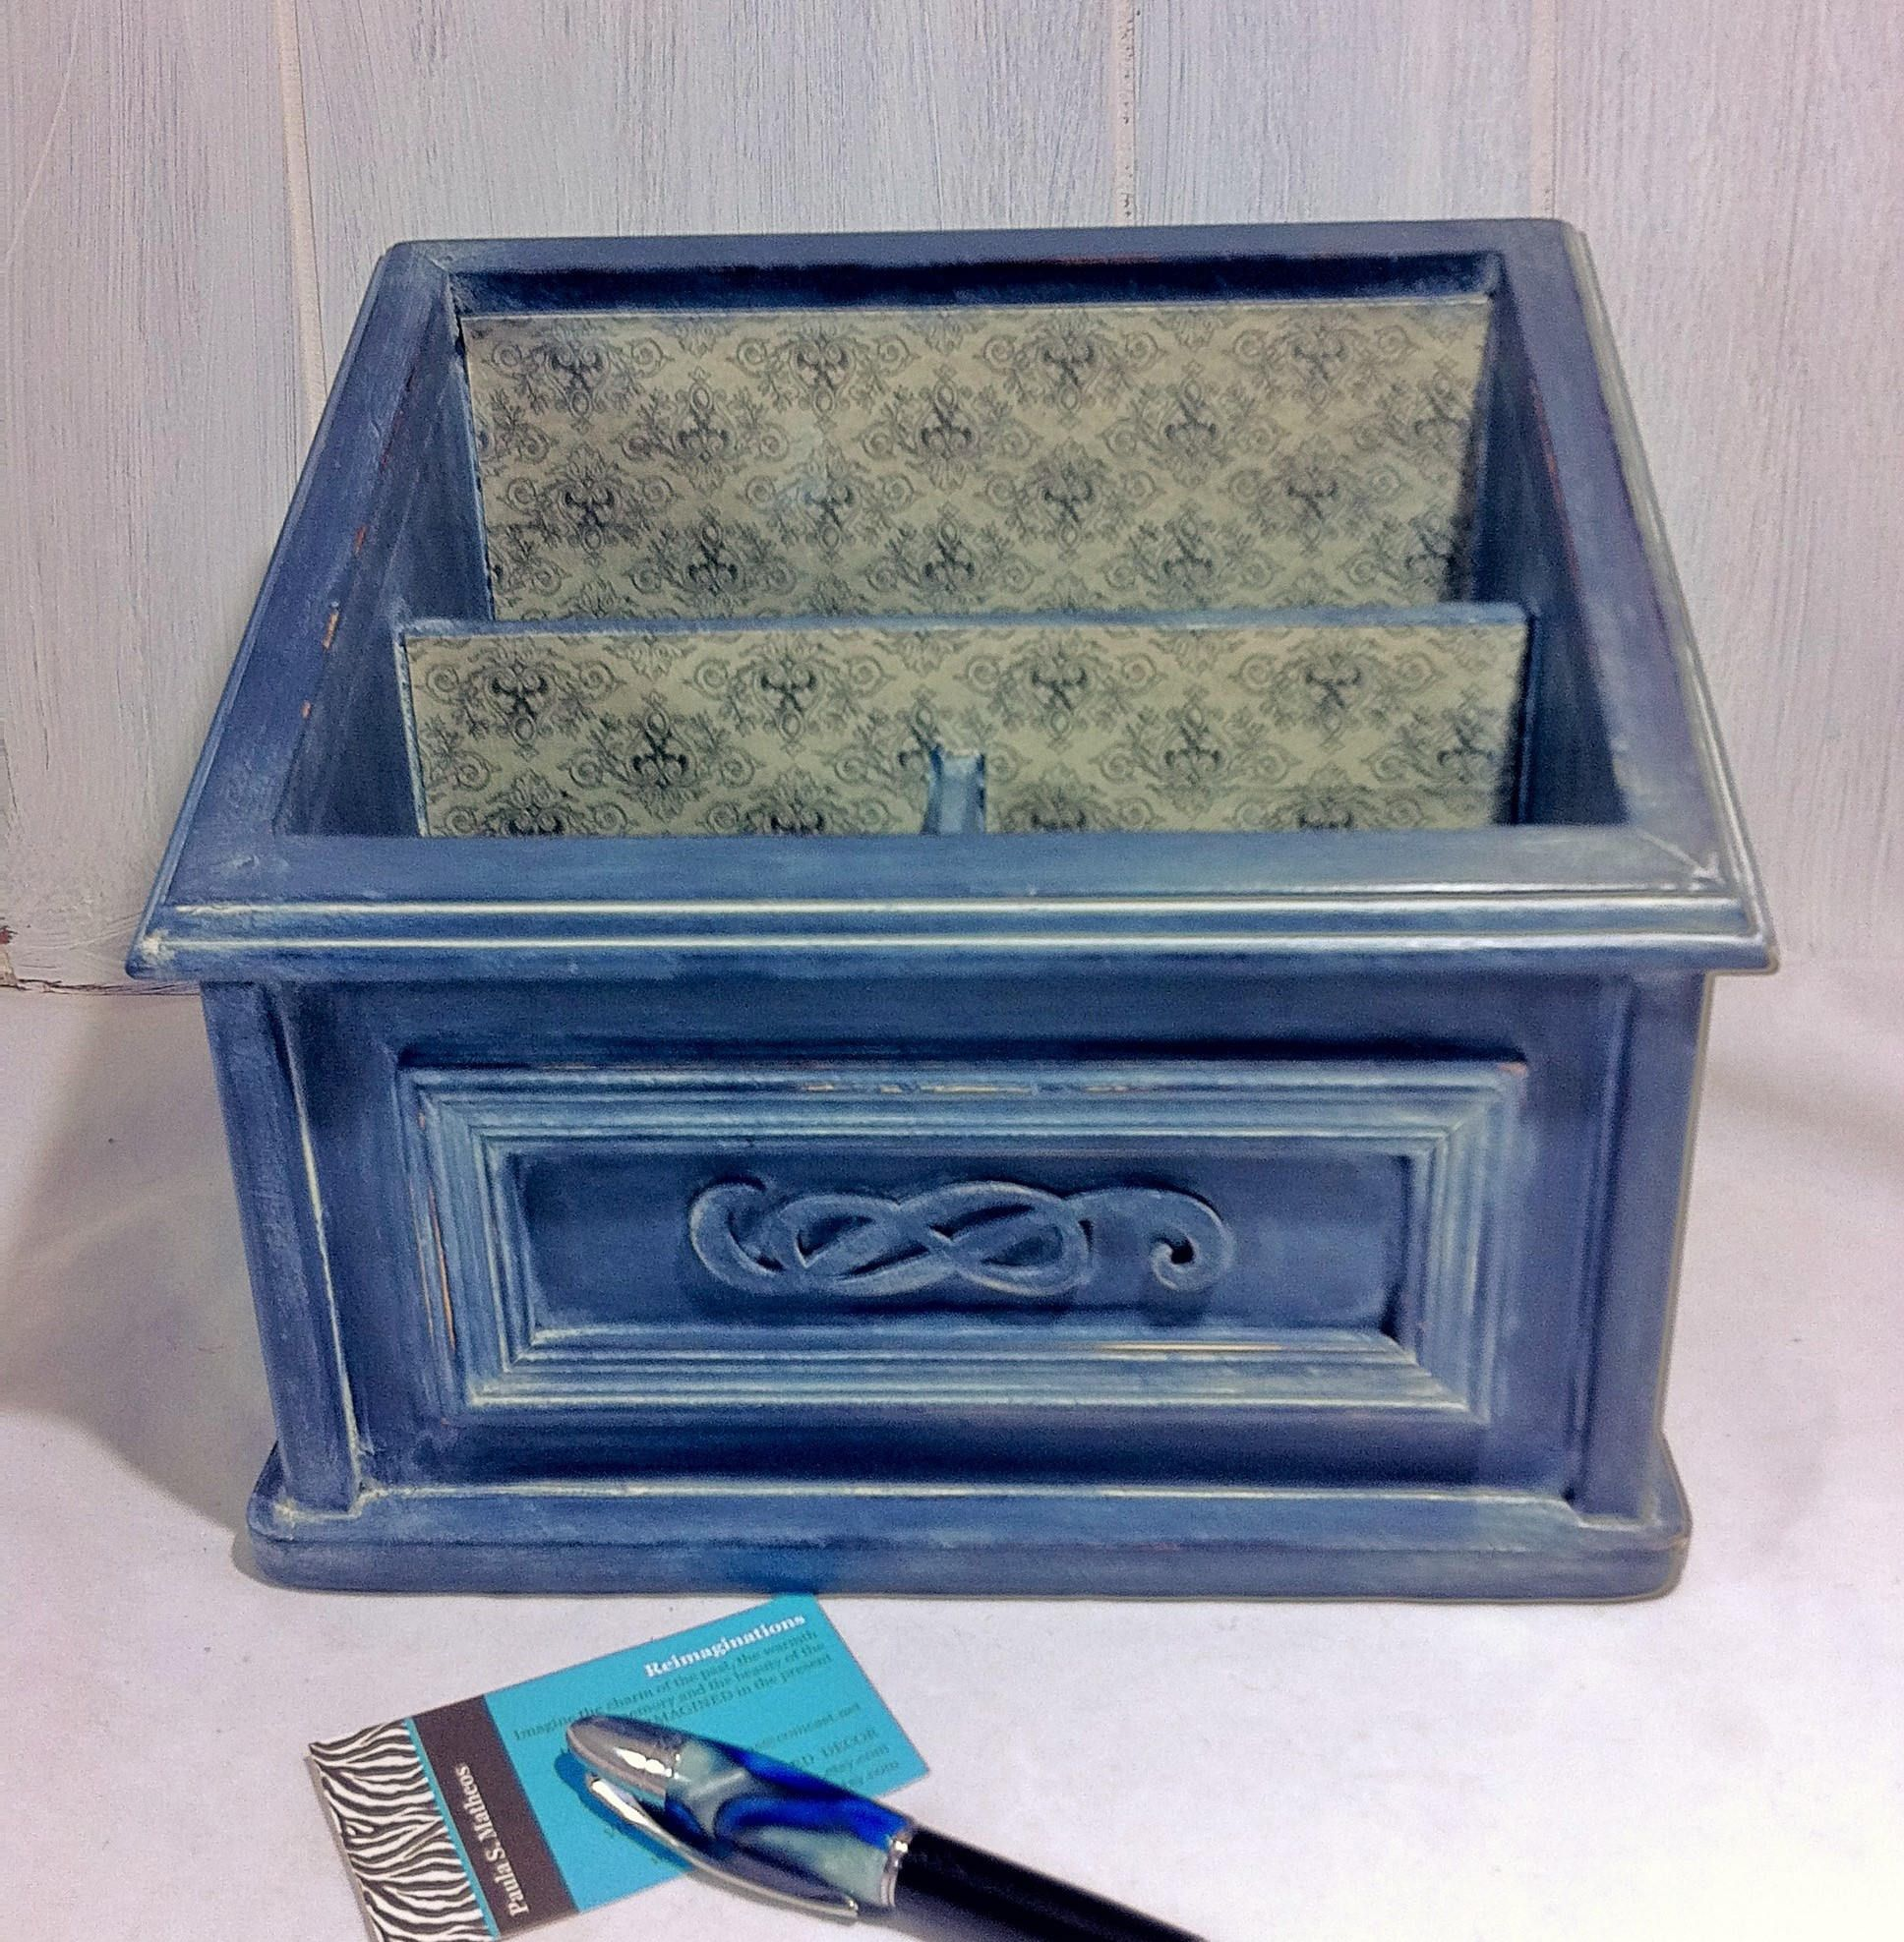 Gray Desk Top Mail Holder Damask Desk Accessory Home fice Decor fice Desk Caddy Stationery Desk Organizer fice Supply Organizer